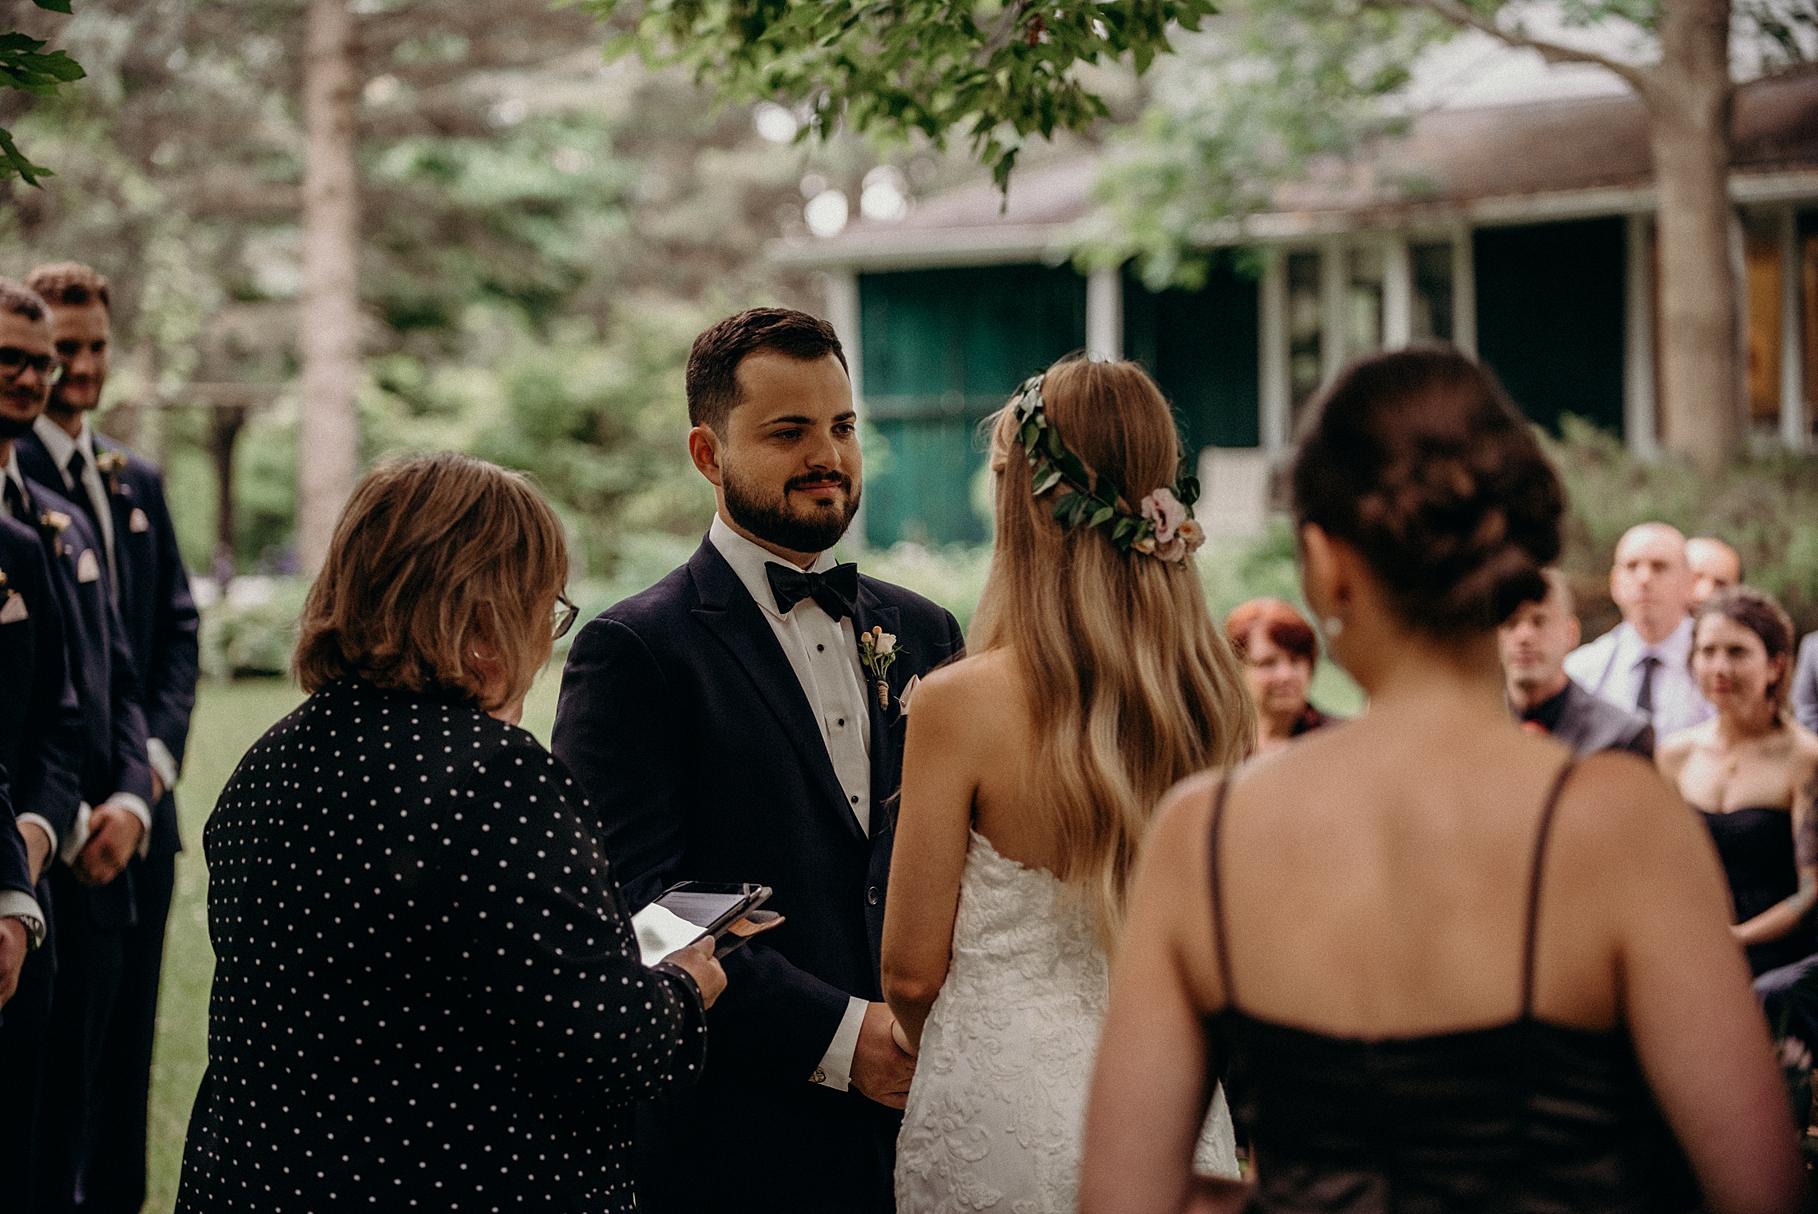 Saunders Farm Wedding Mocha Tree Studios Ottawa Toronto Montreal Wedding and Engagement Photographer and Videographer Dark Moody Intimate Authentic Modern Romantic Cinematic Best Candid 24